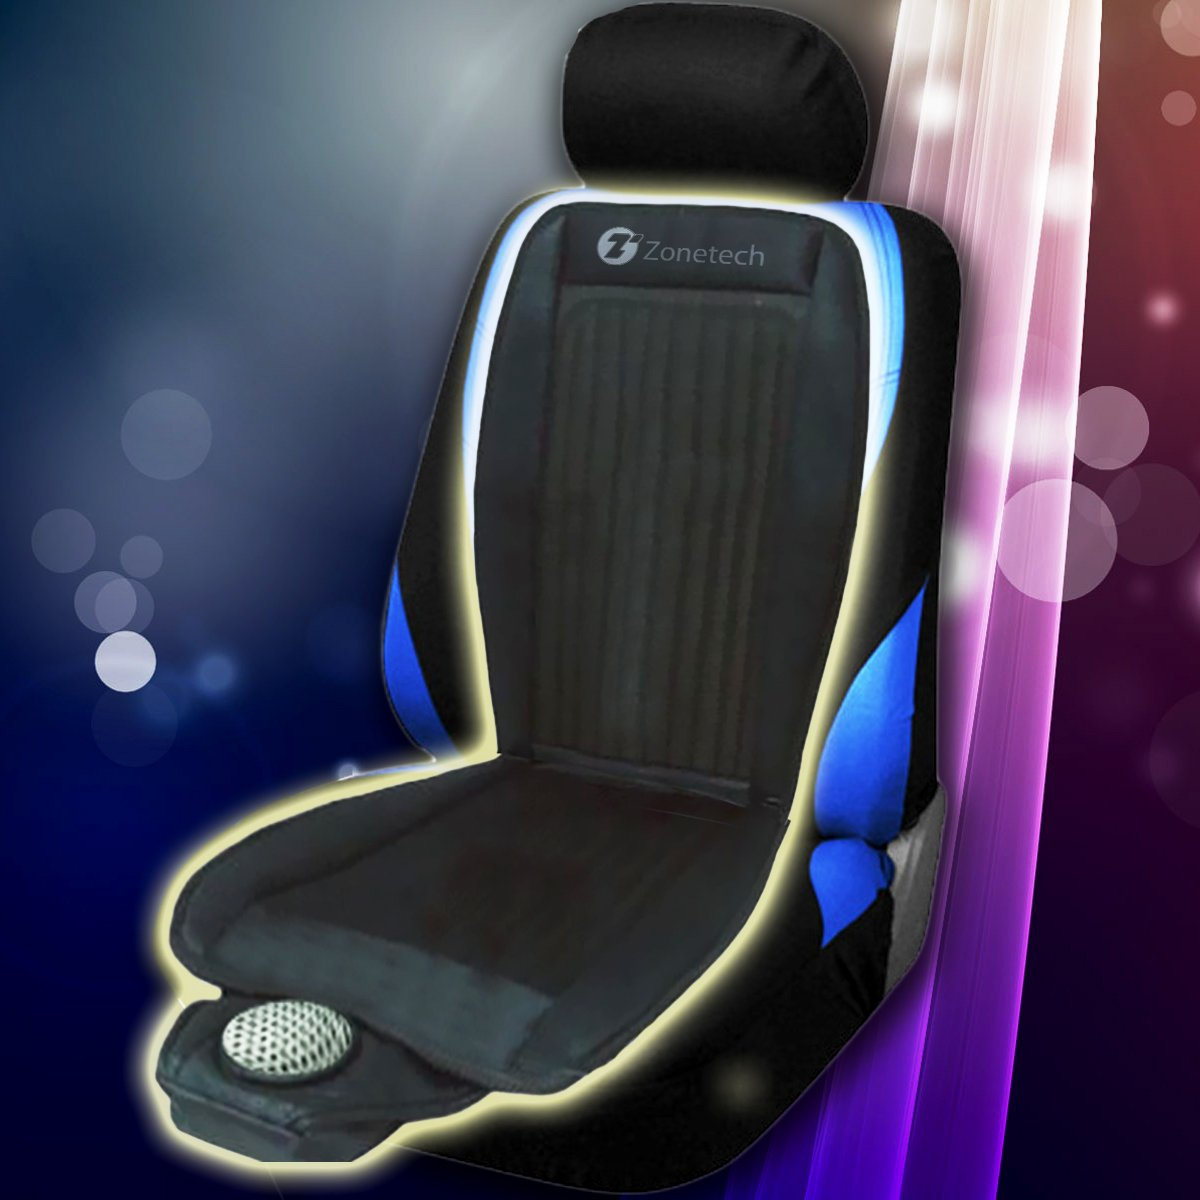 zone tech 2x black cooling car seat cushion cooler 12v adjustable temperature ebay. Black Bedroom Furniture Sets. Home Design Ideas